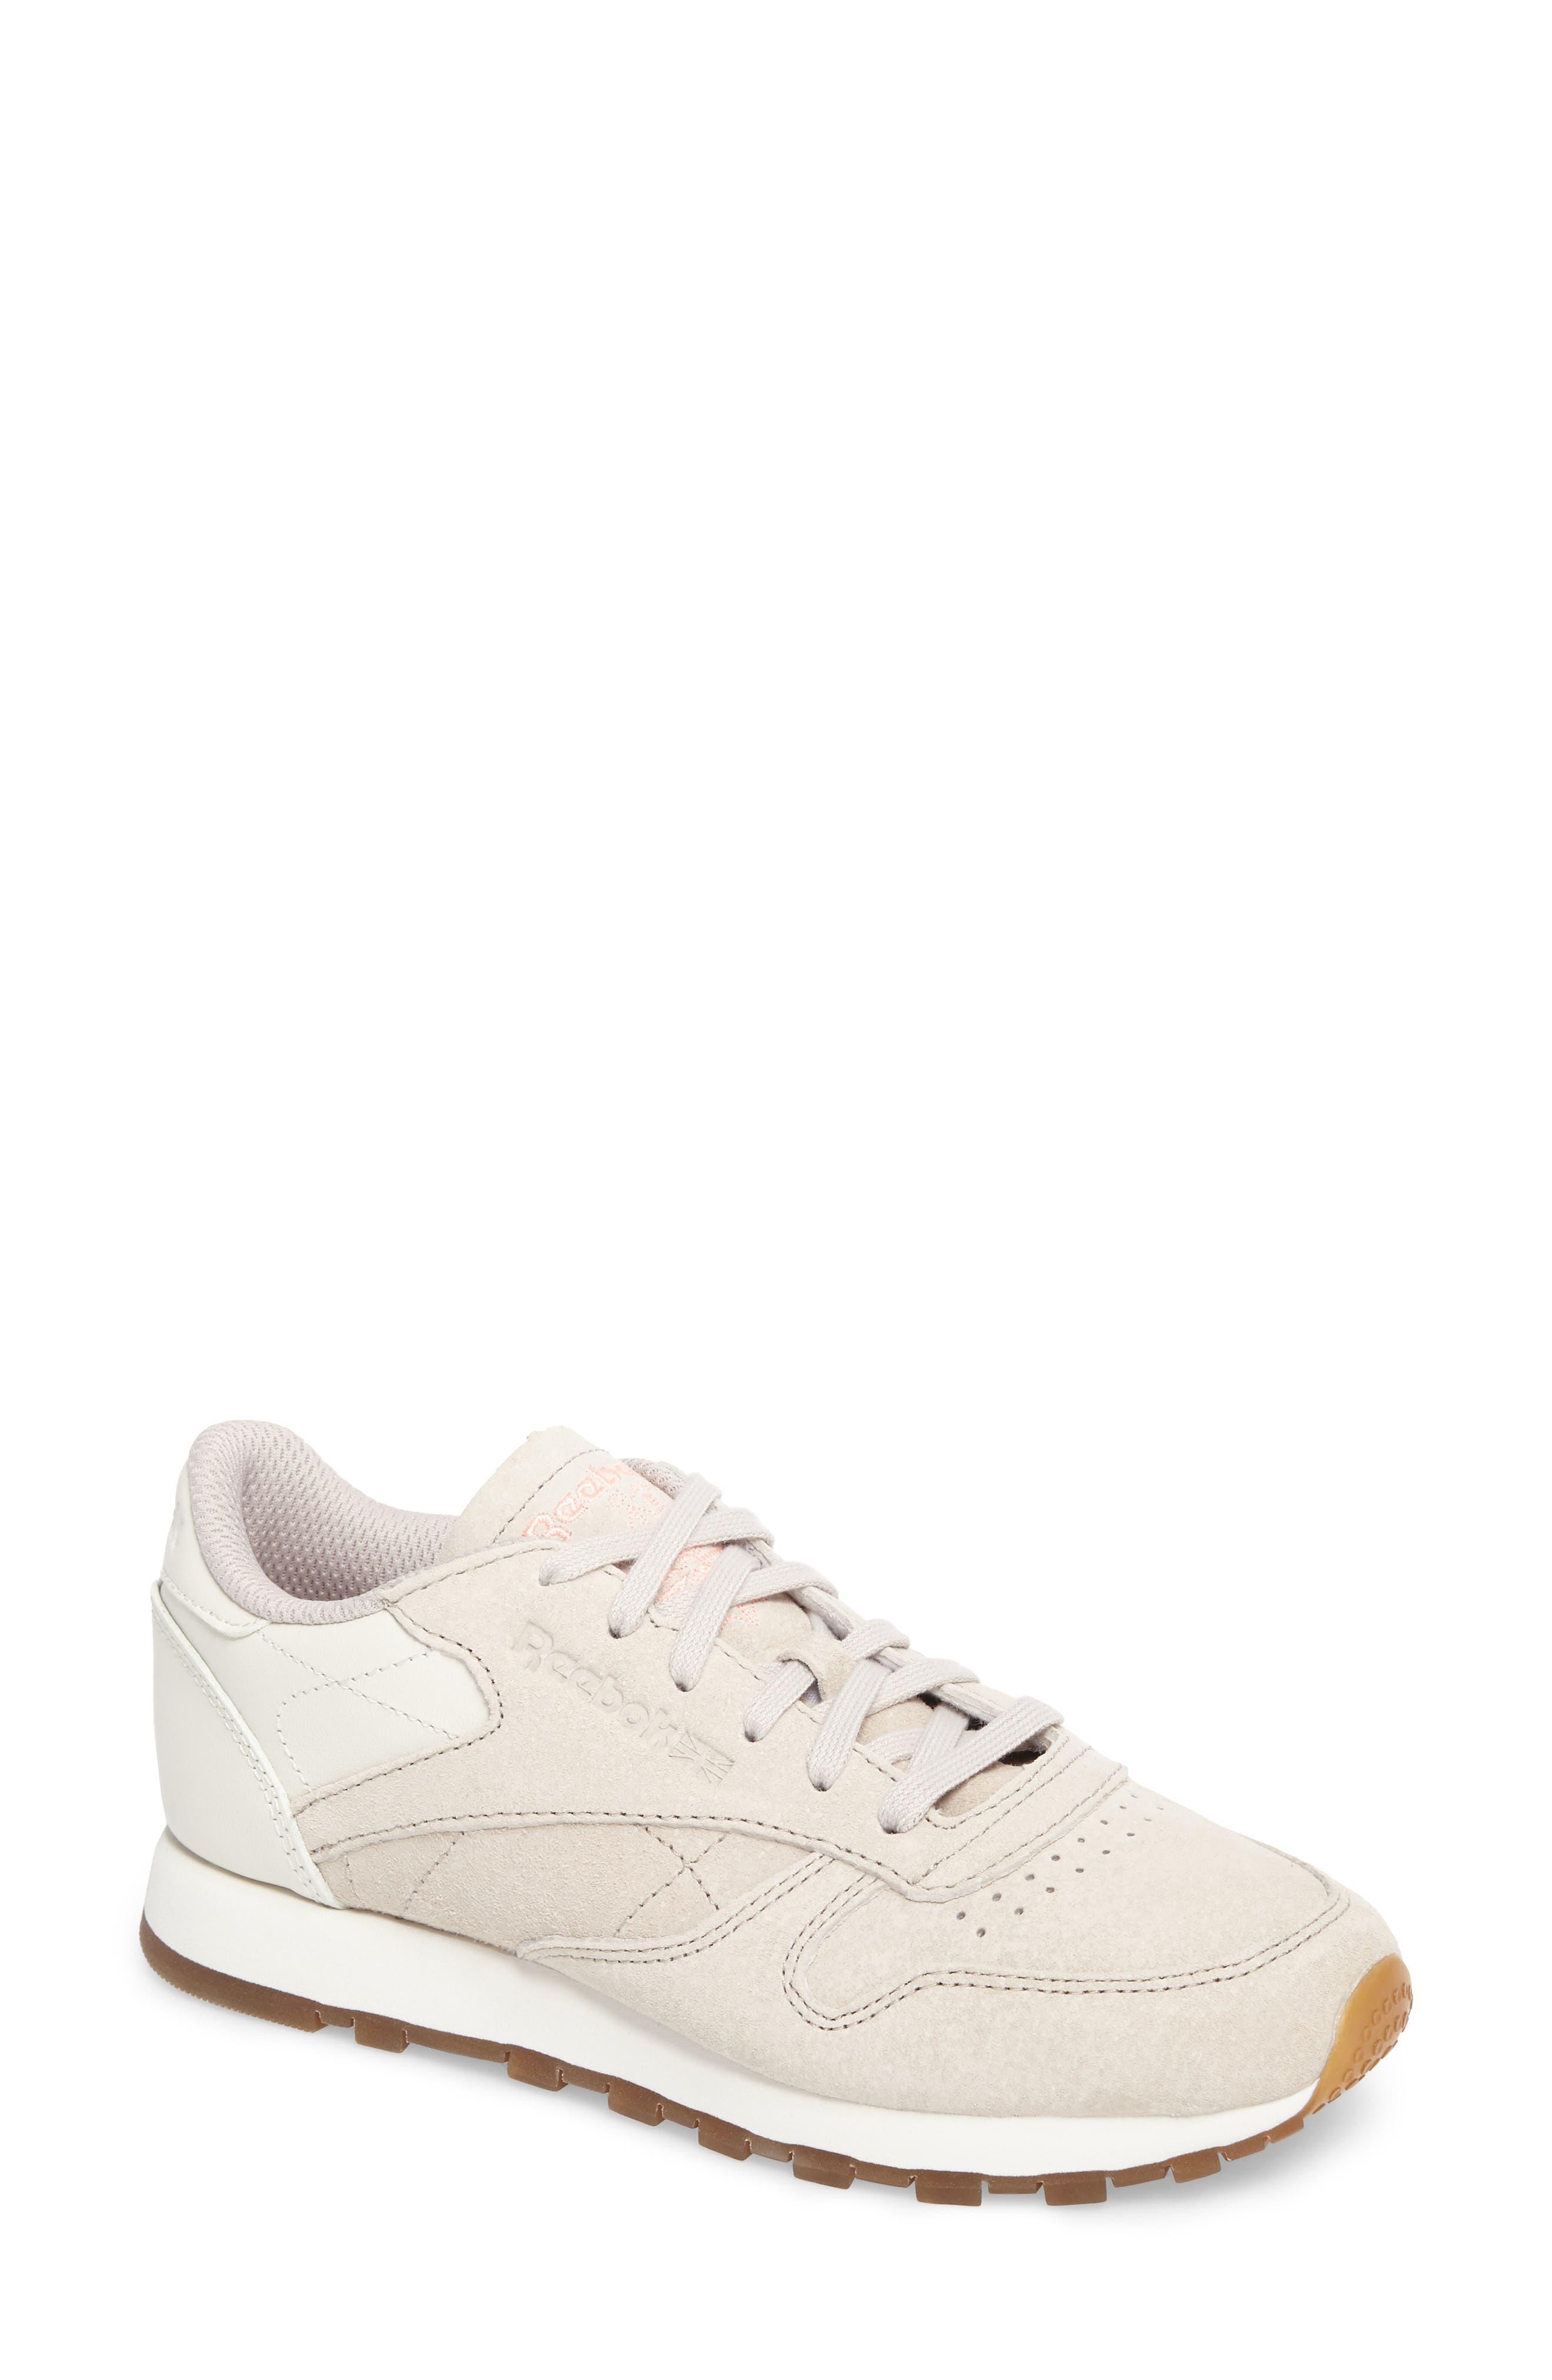 Alternate Image 1 Selected - Reebok Classic Sneaker (Women)